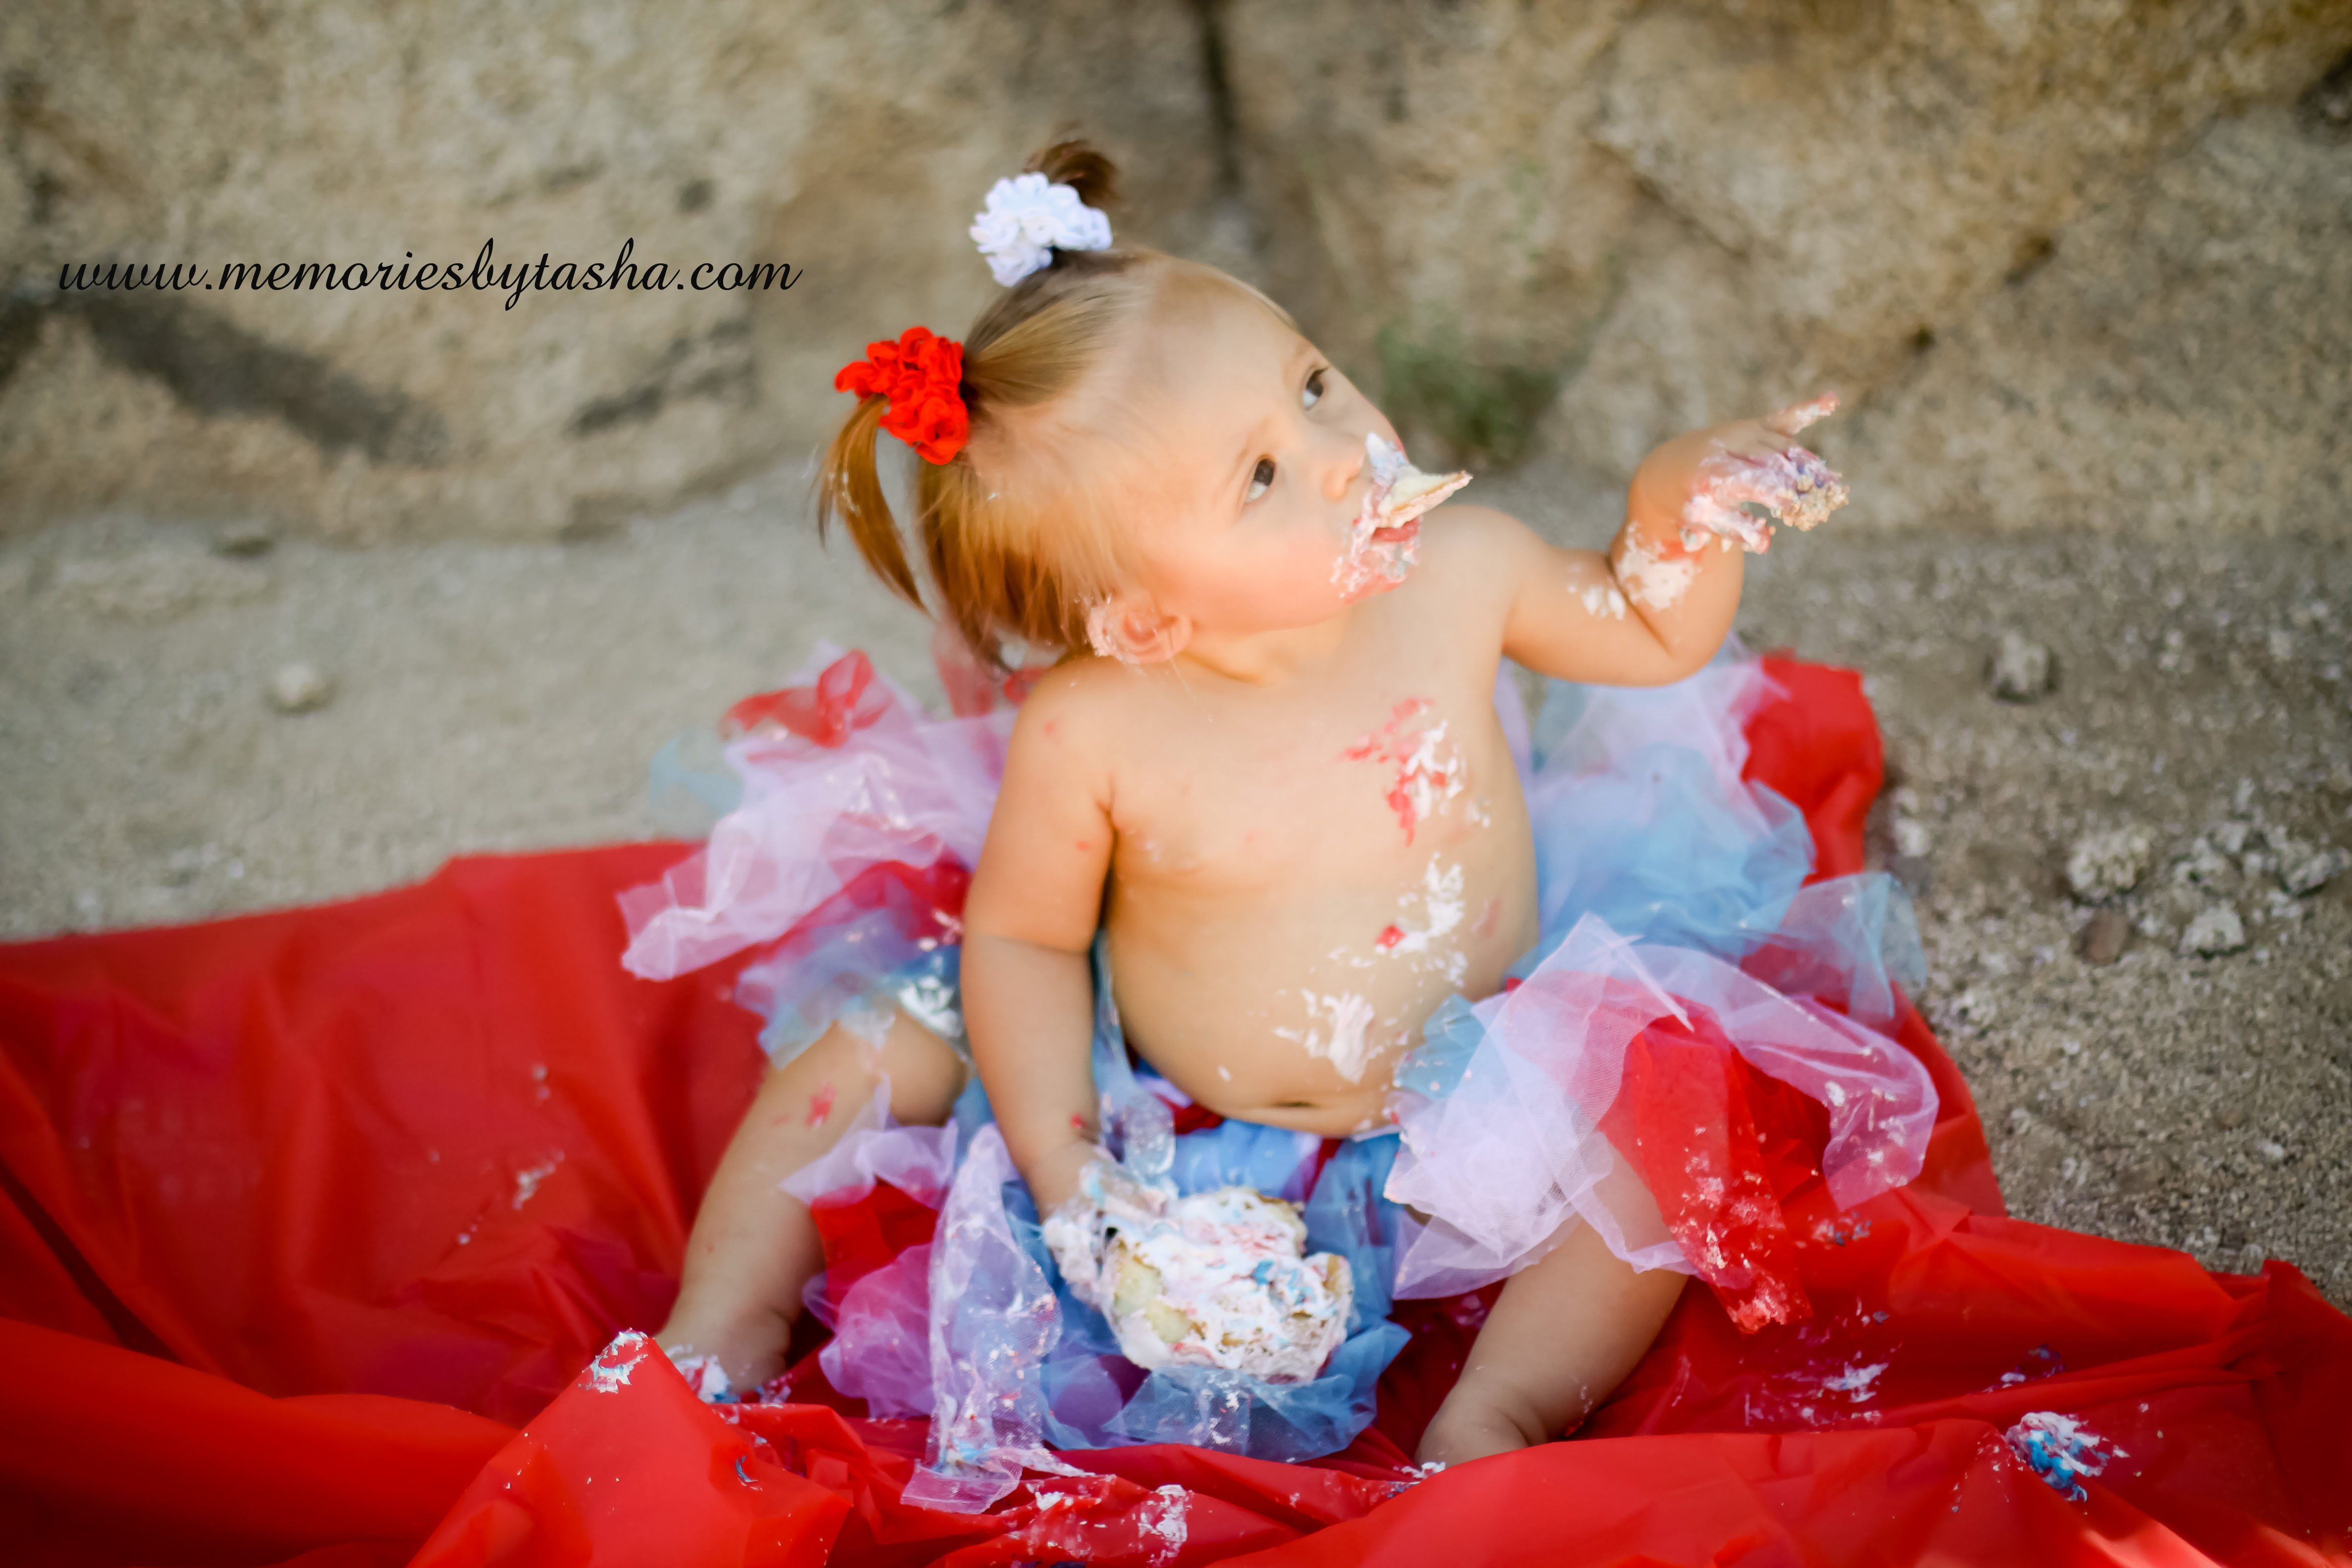 Twentynine Palms Photographer - Couples Photography - Family Photography - Children's Photography - Cake Smash-01